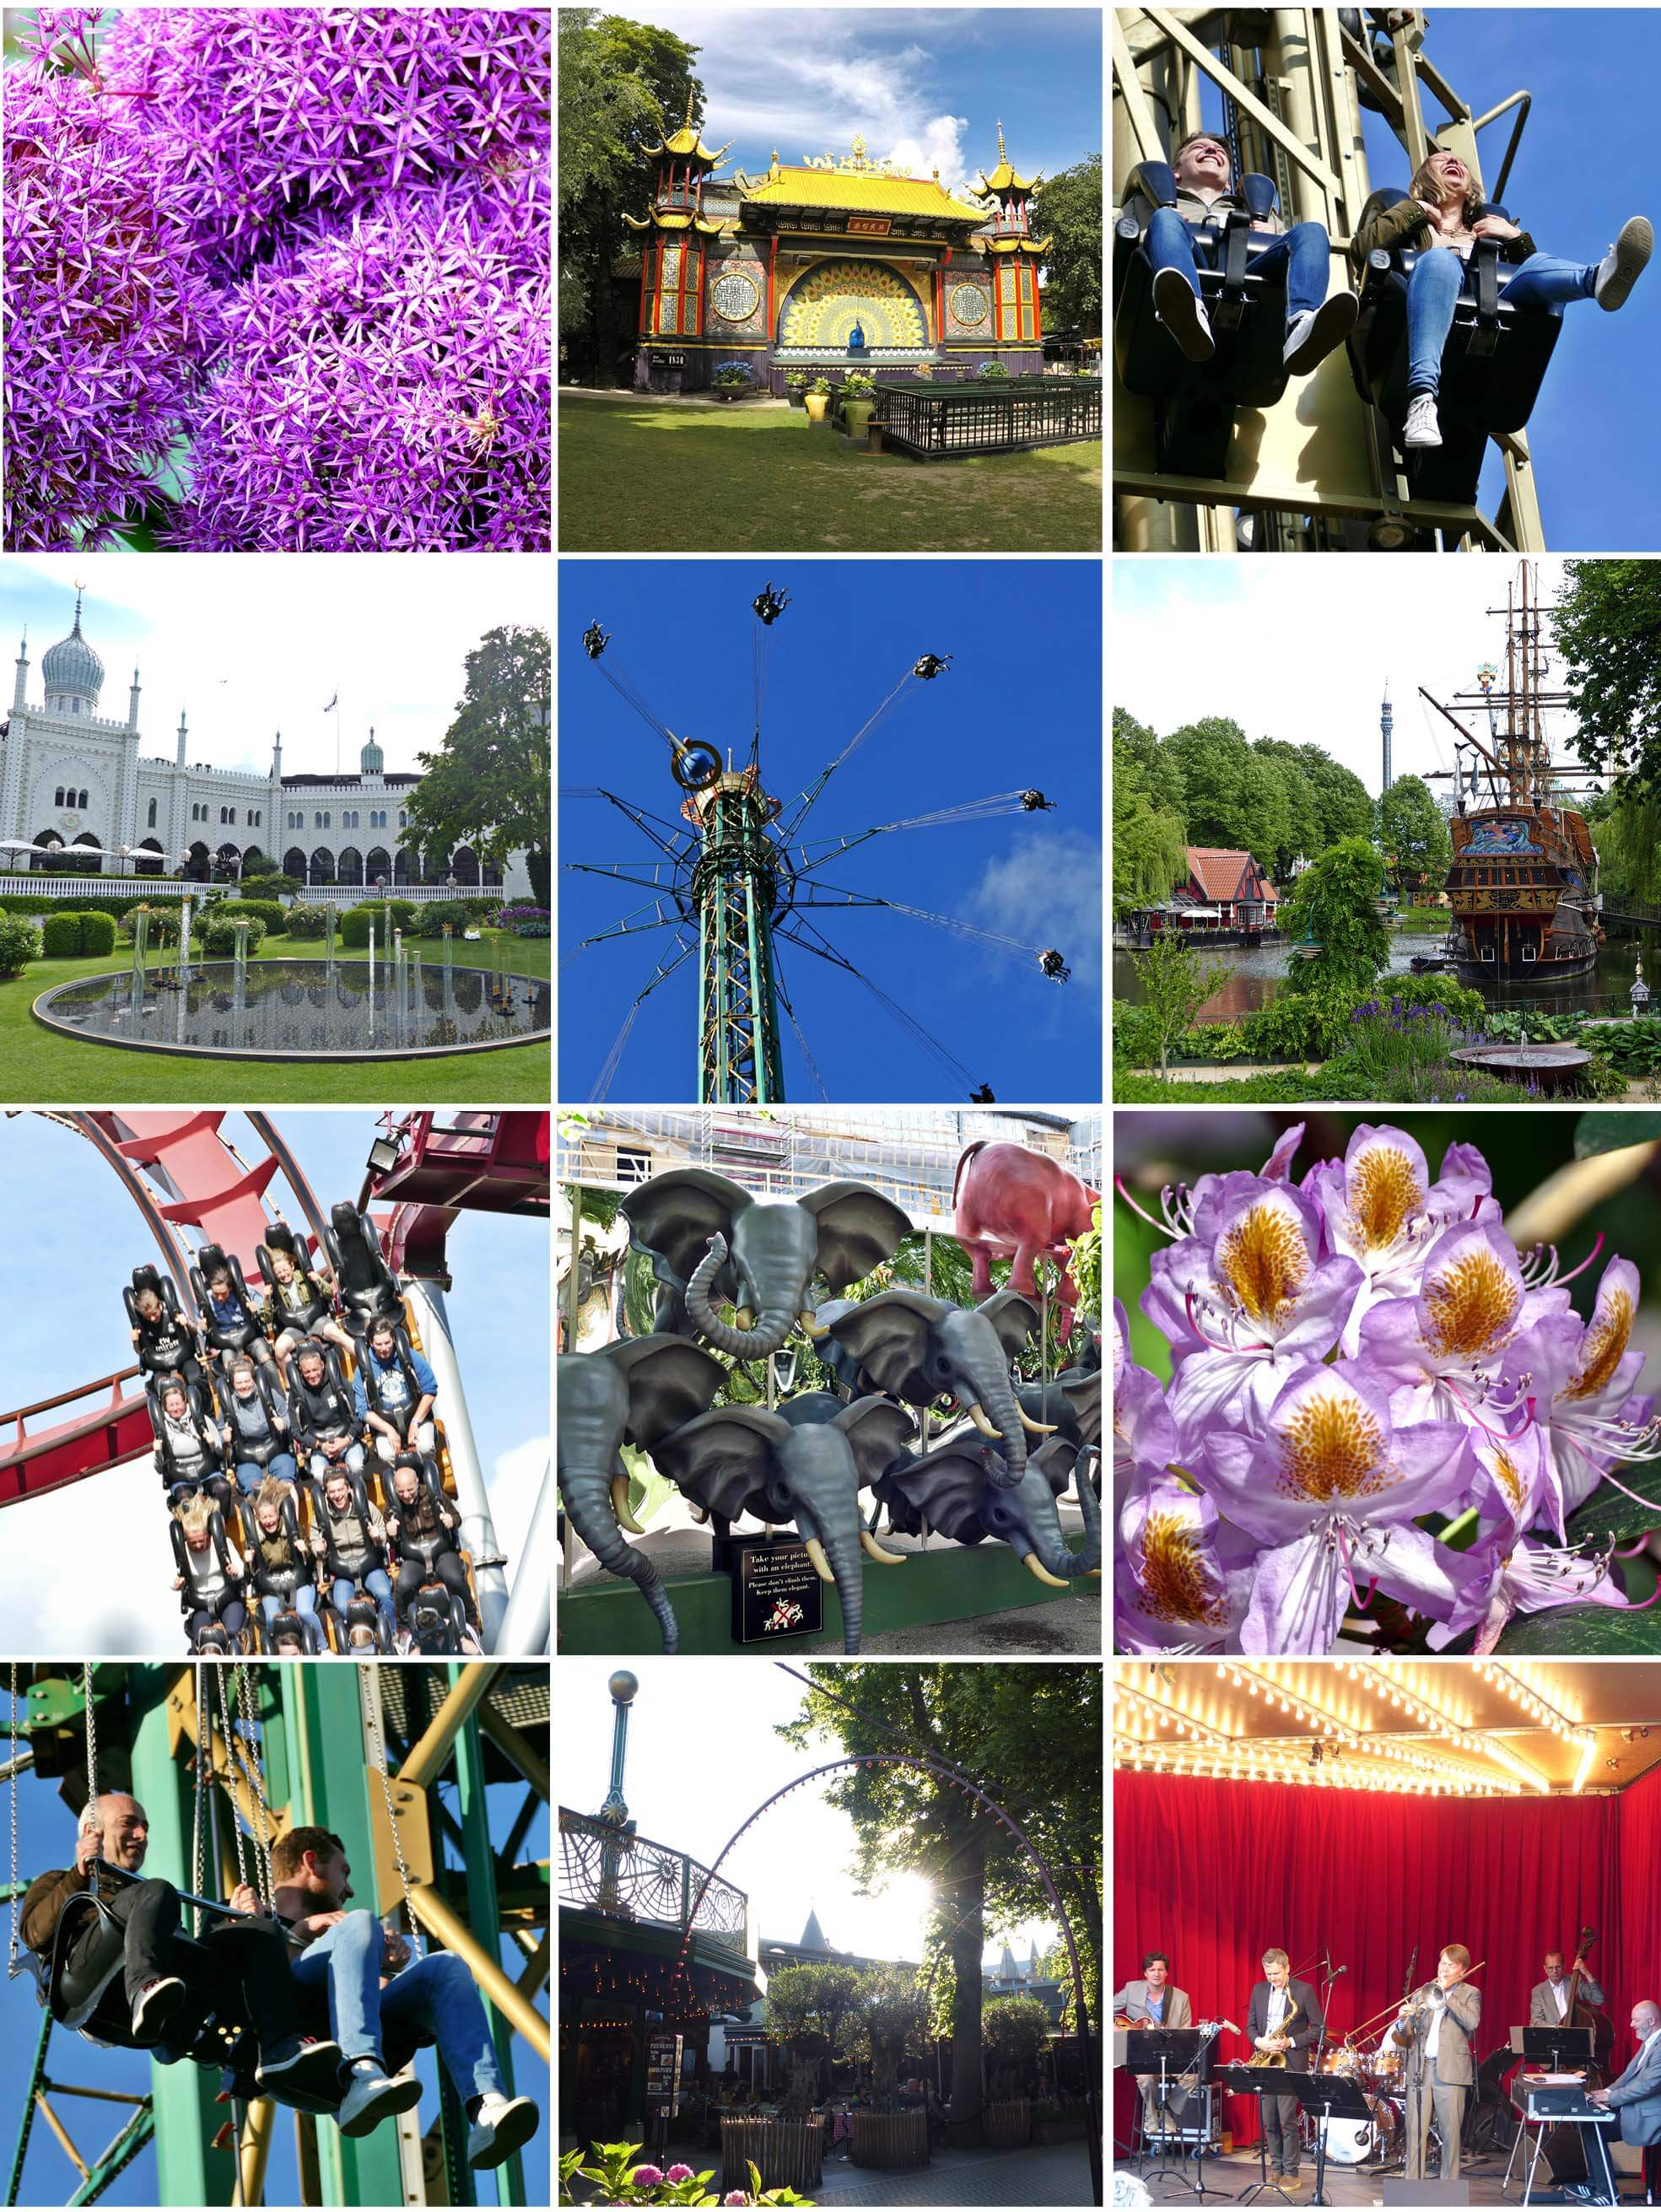 copenhague, danemark, Denmark, voyage, europe, tivoli, garden, attraction, fleurs, jardin